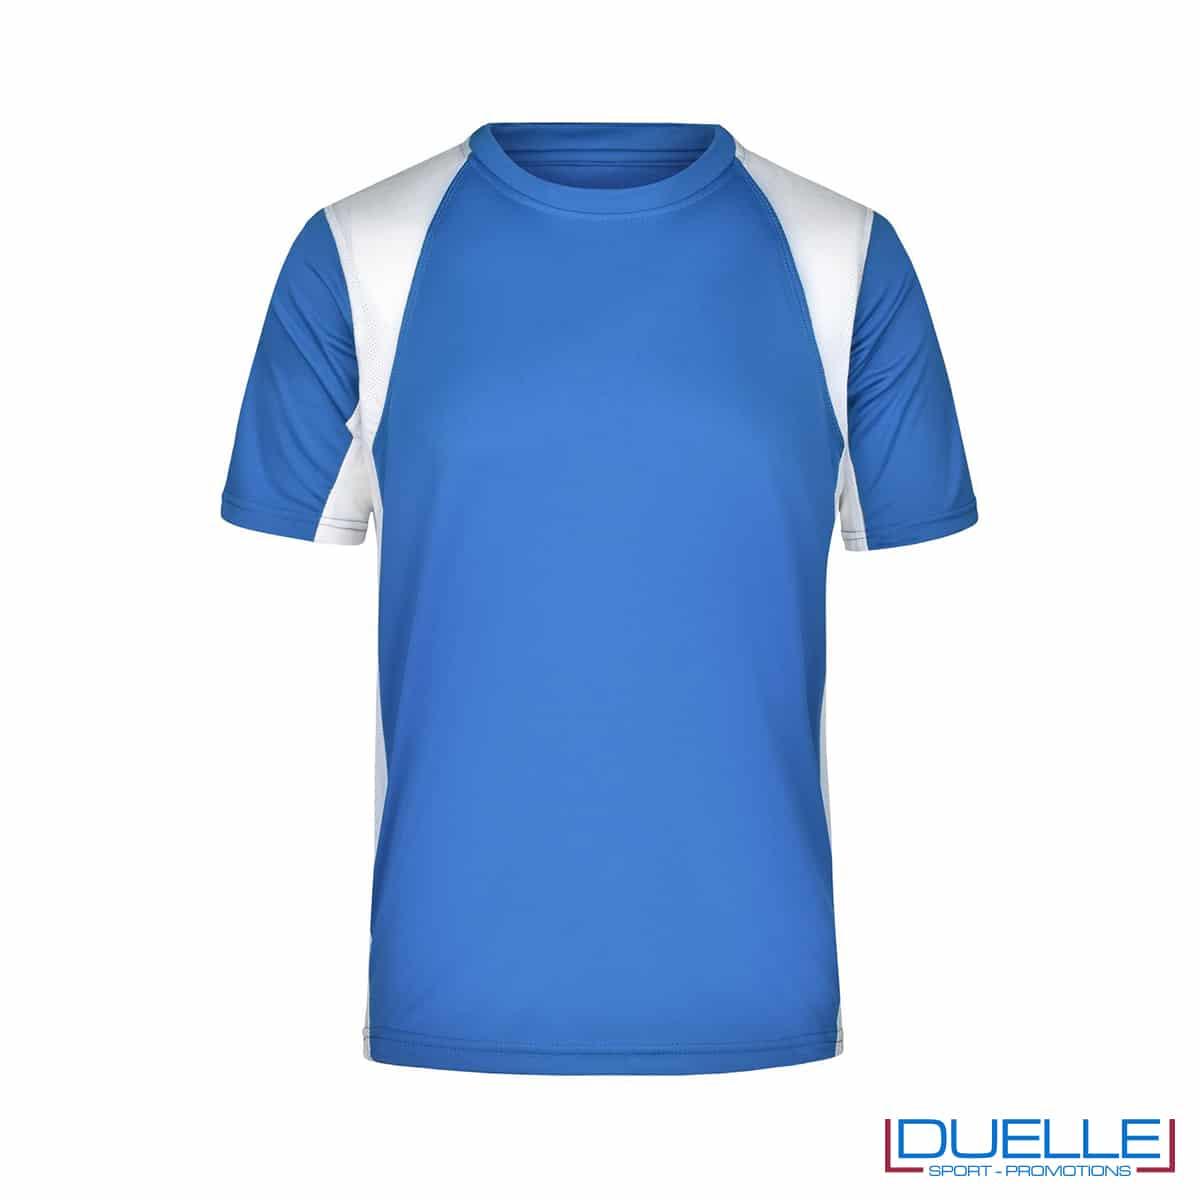 T-shirt running uomo personalizzata colore blu royal-bianco